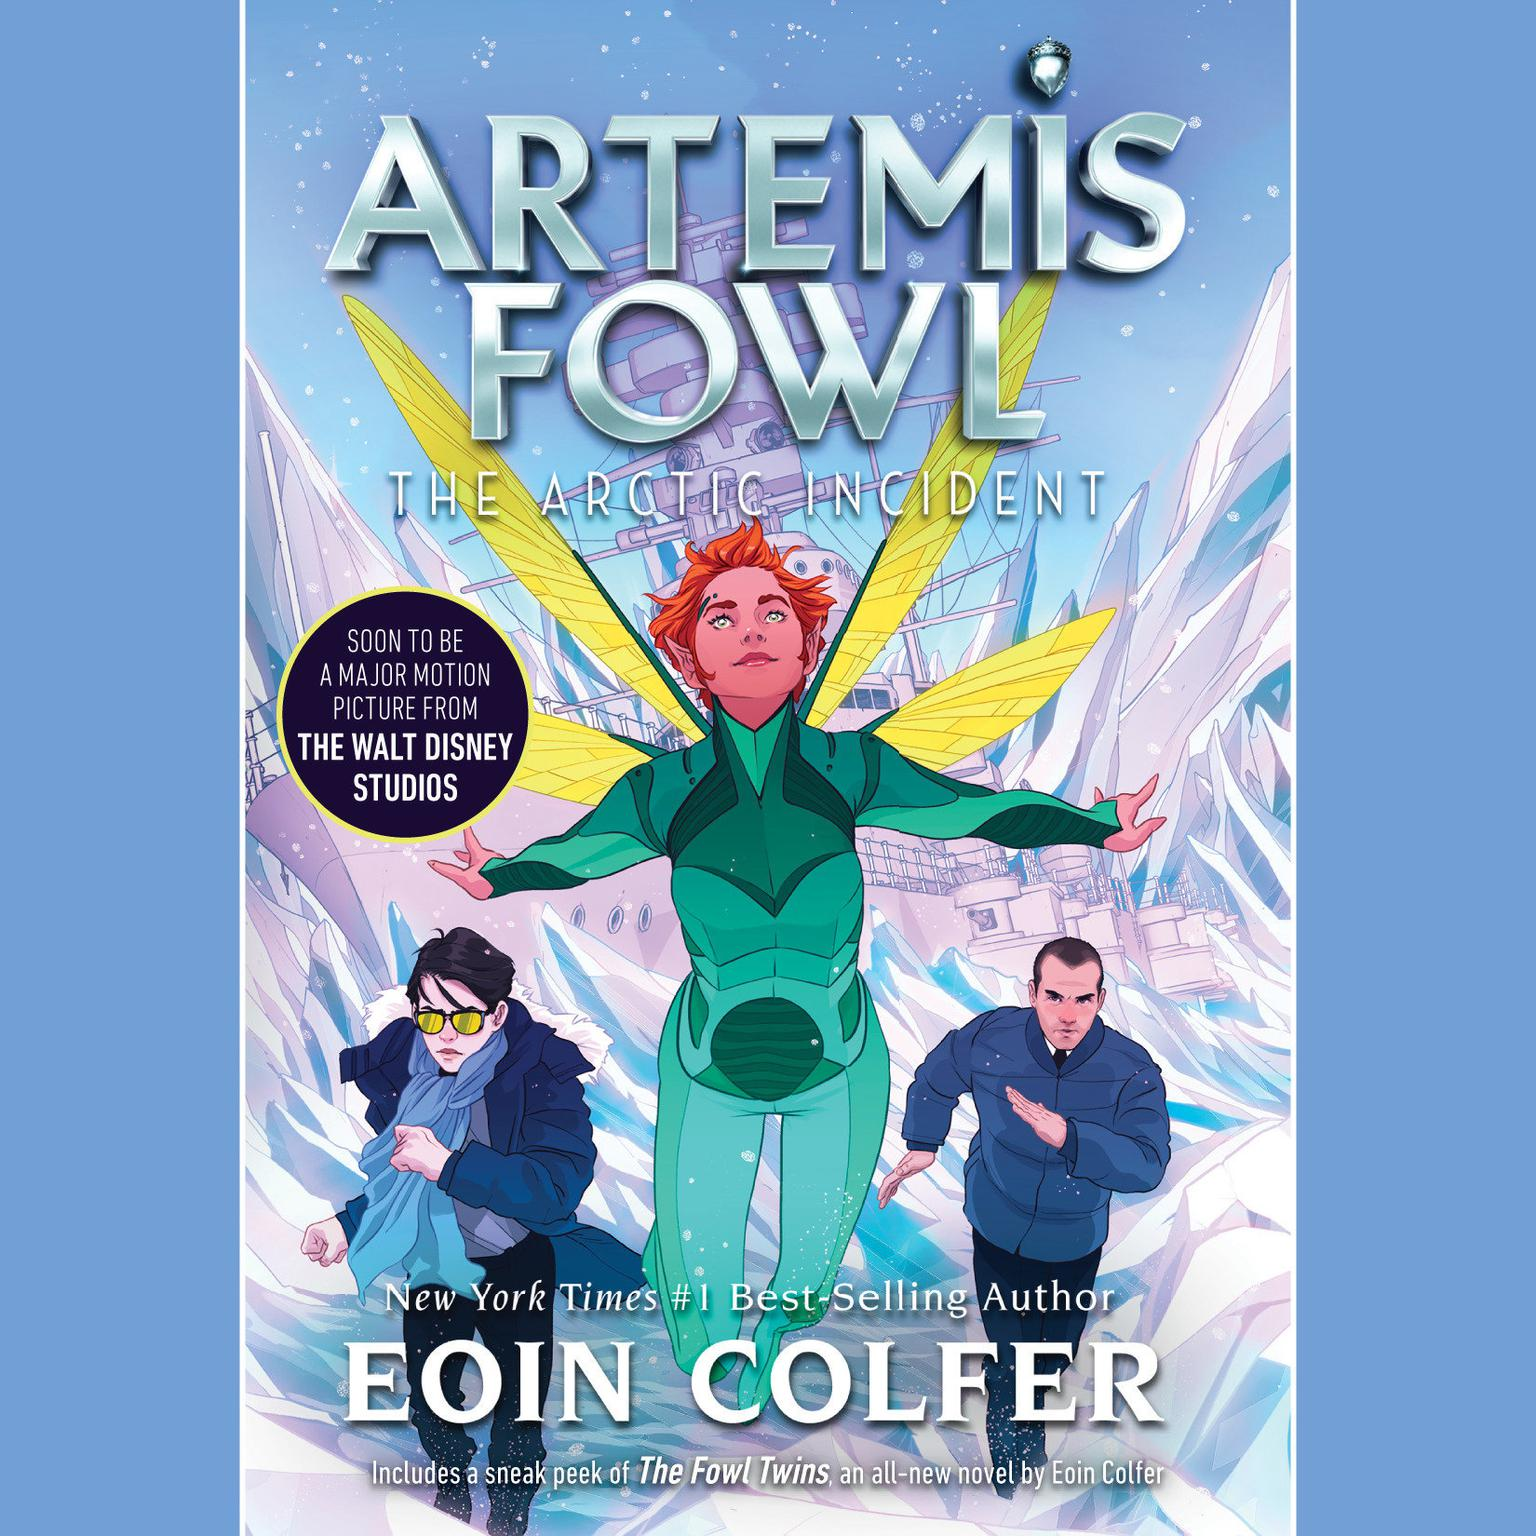 Artemis Fowl 2 The Arctic Incident  Audiobook Listen